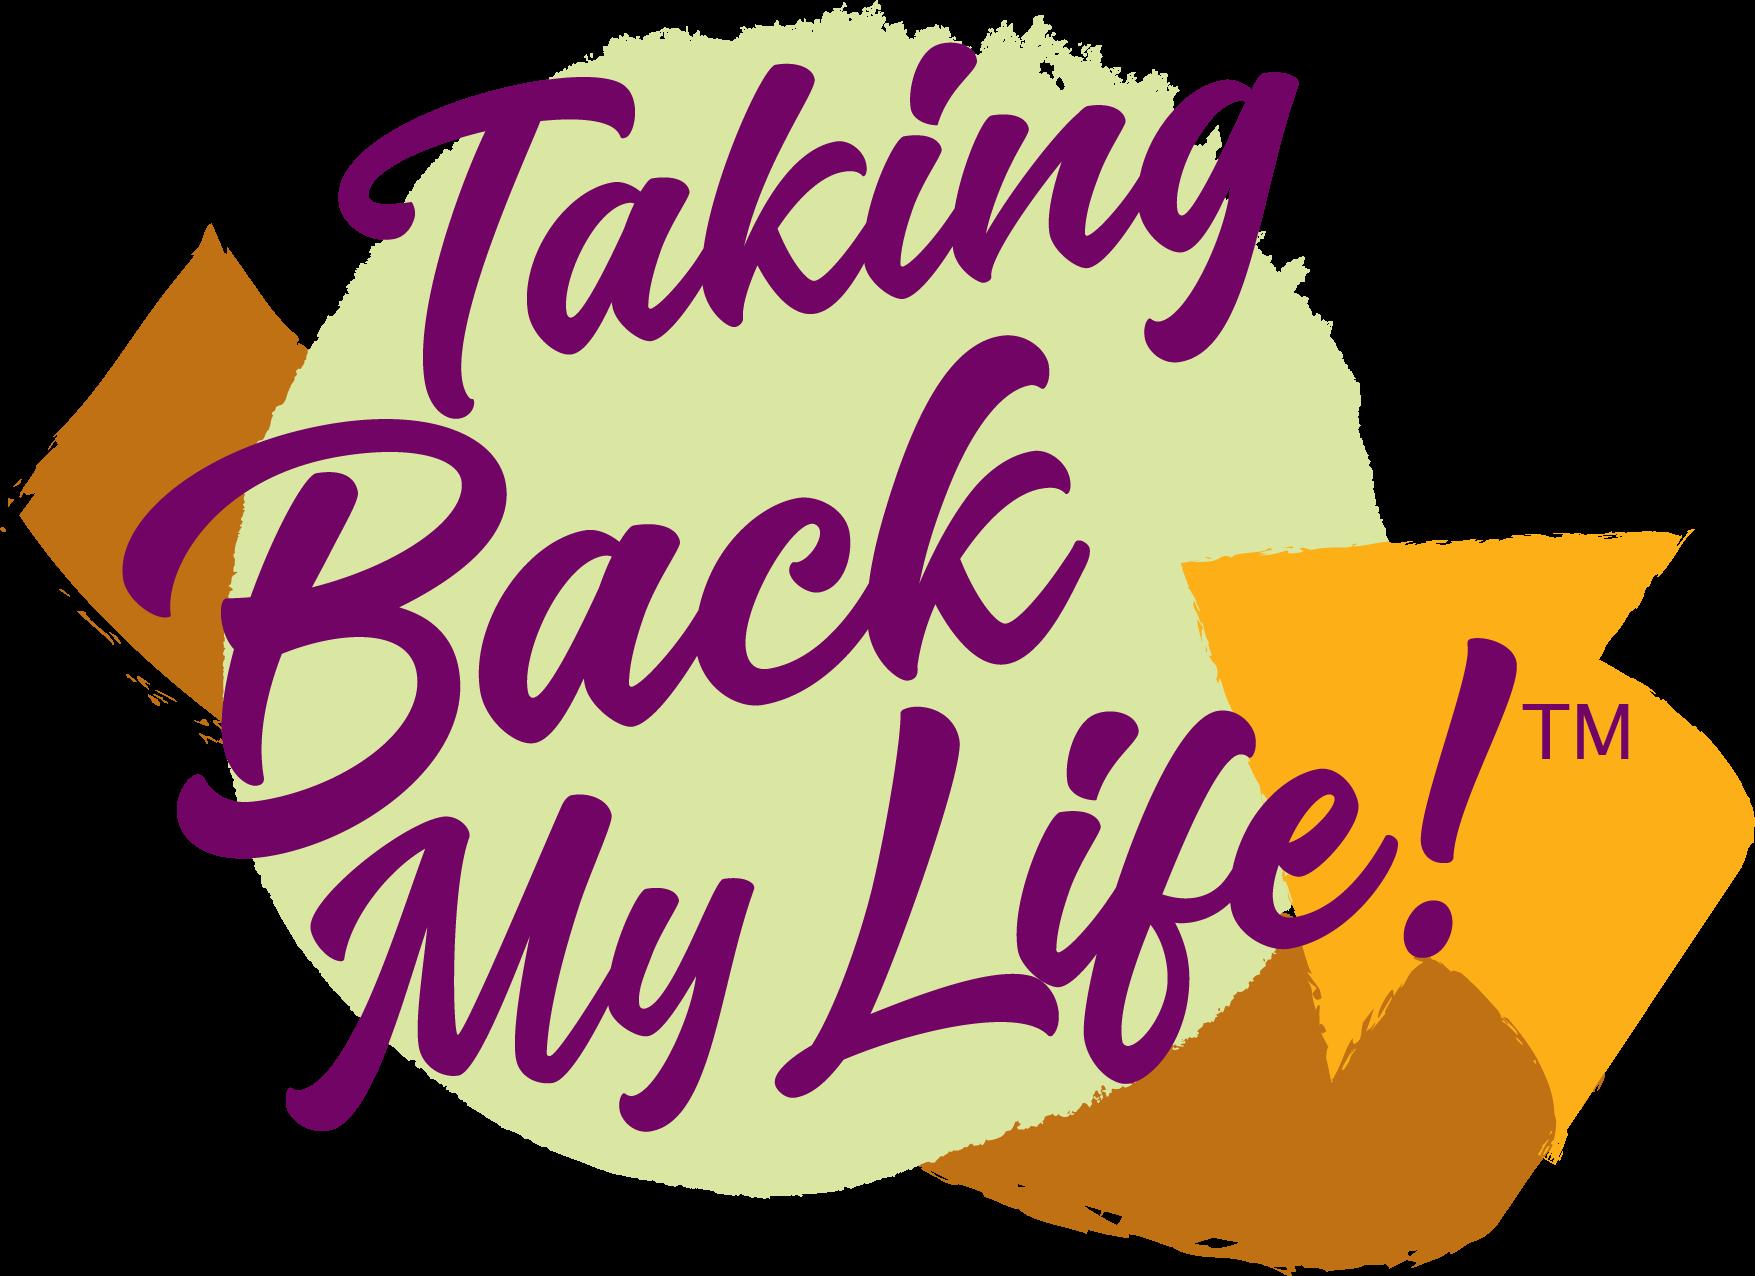 Taking Back My Life! (tm)